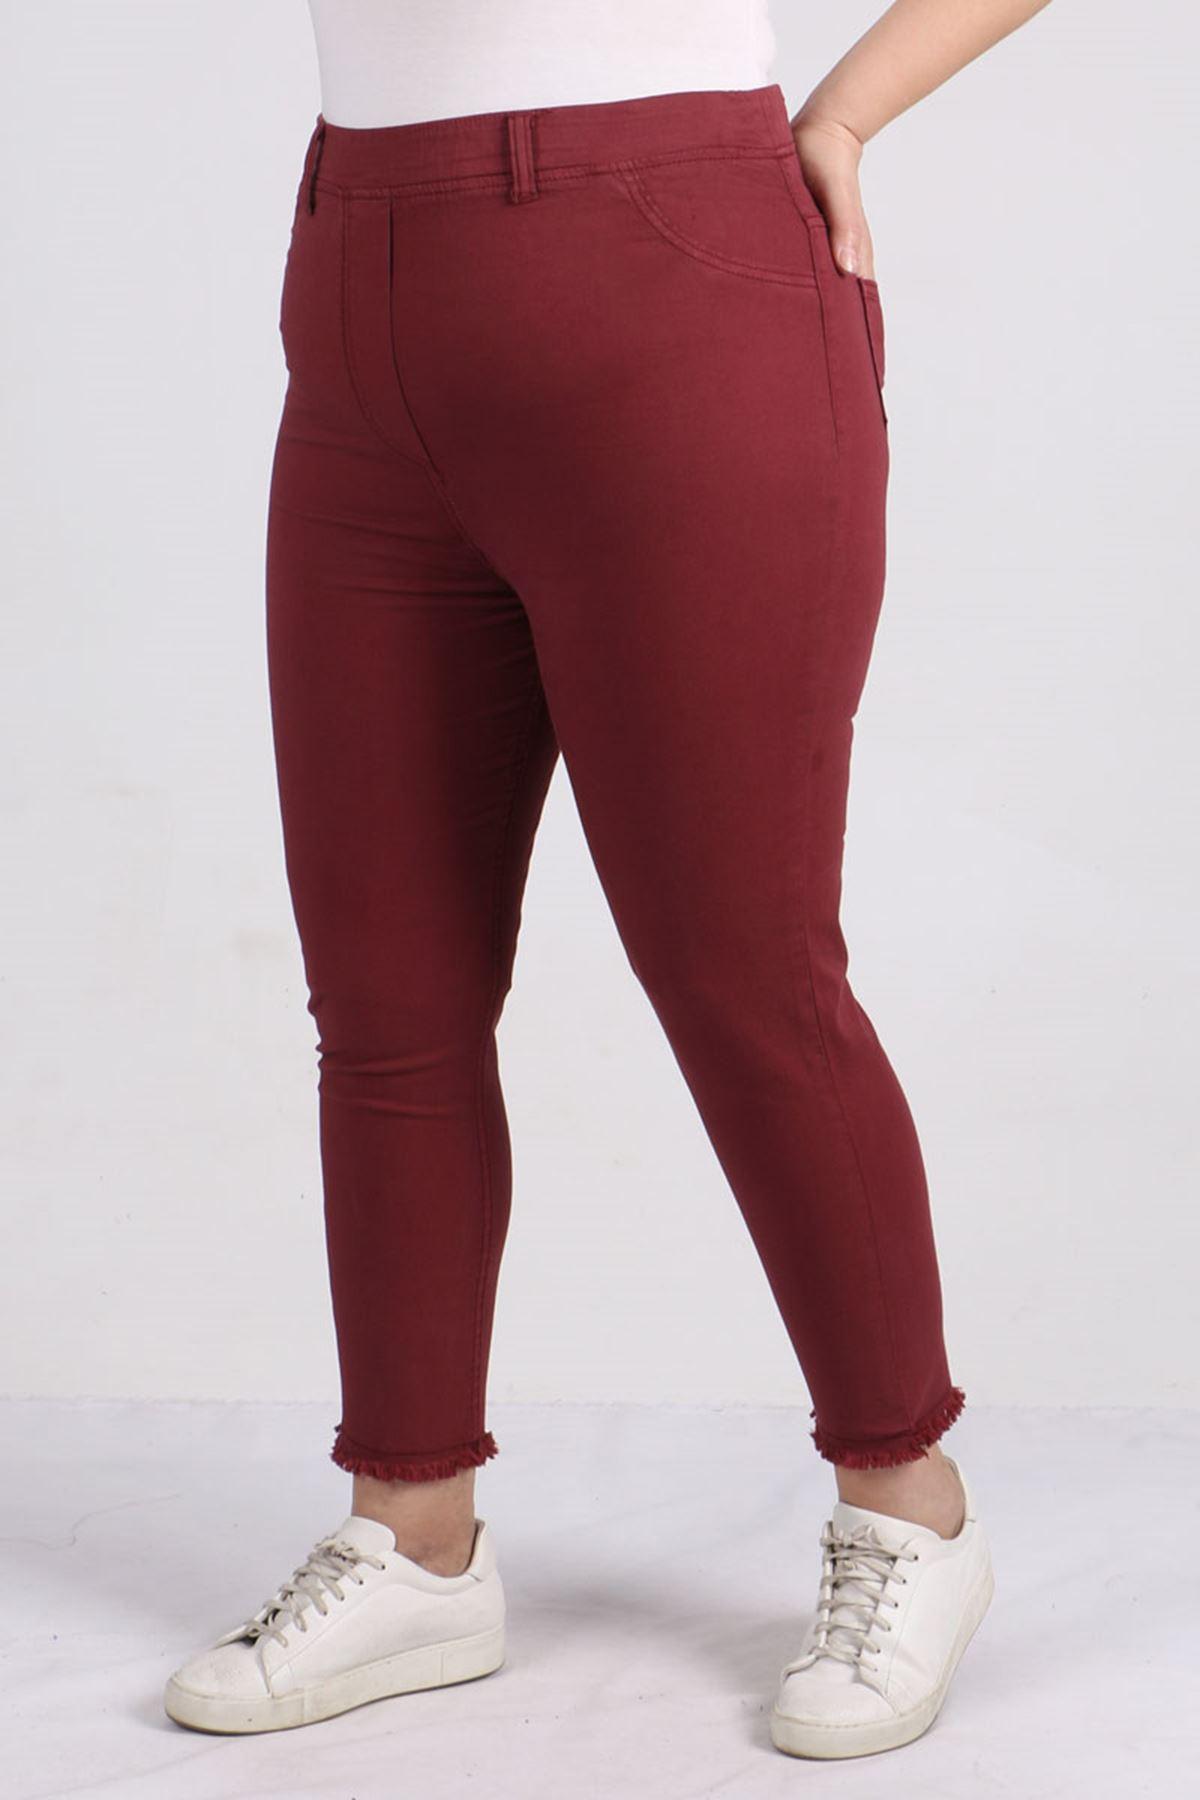 9151 Tasseled Skinny Leg Plus Size Pants - Claret Red